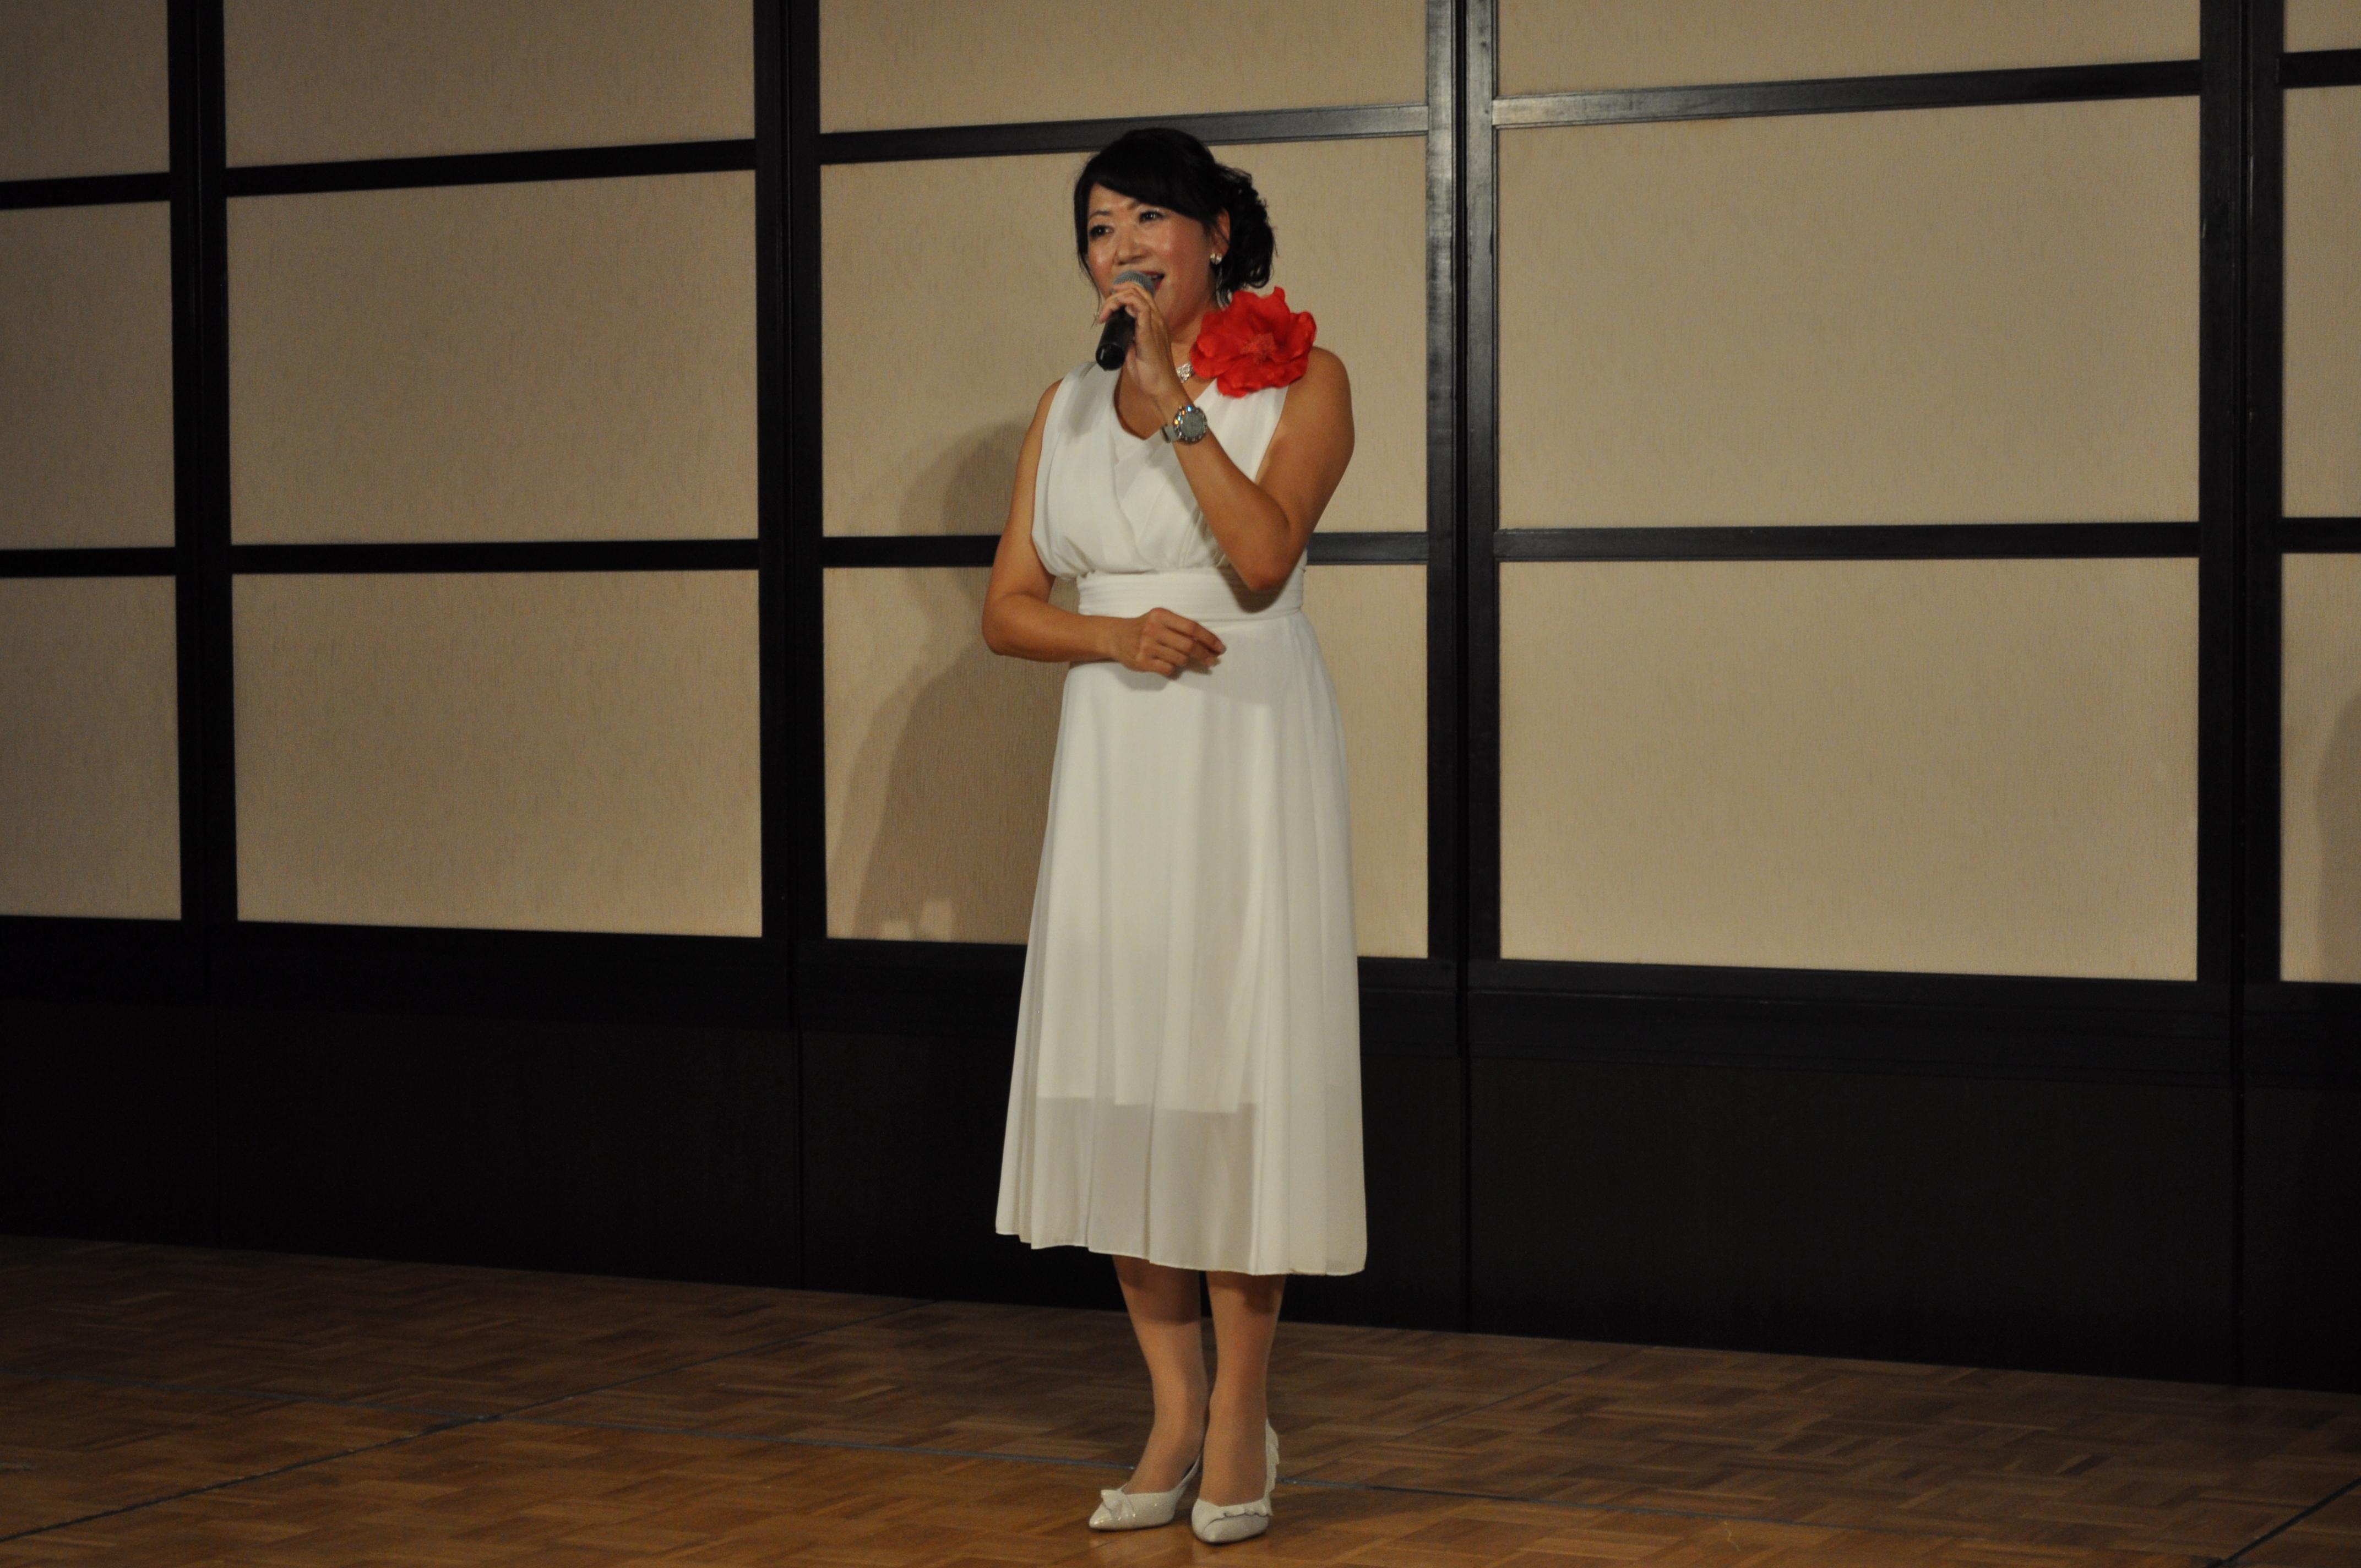 DSC 0480 - 第6回思風会全国大会2018in東京開催